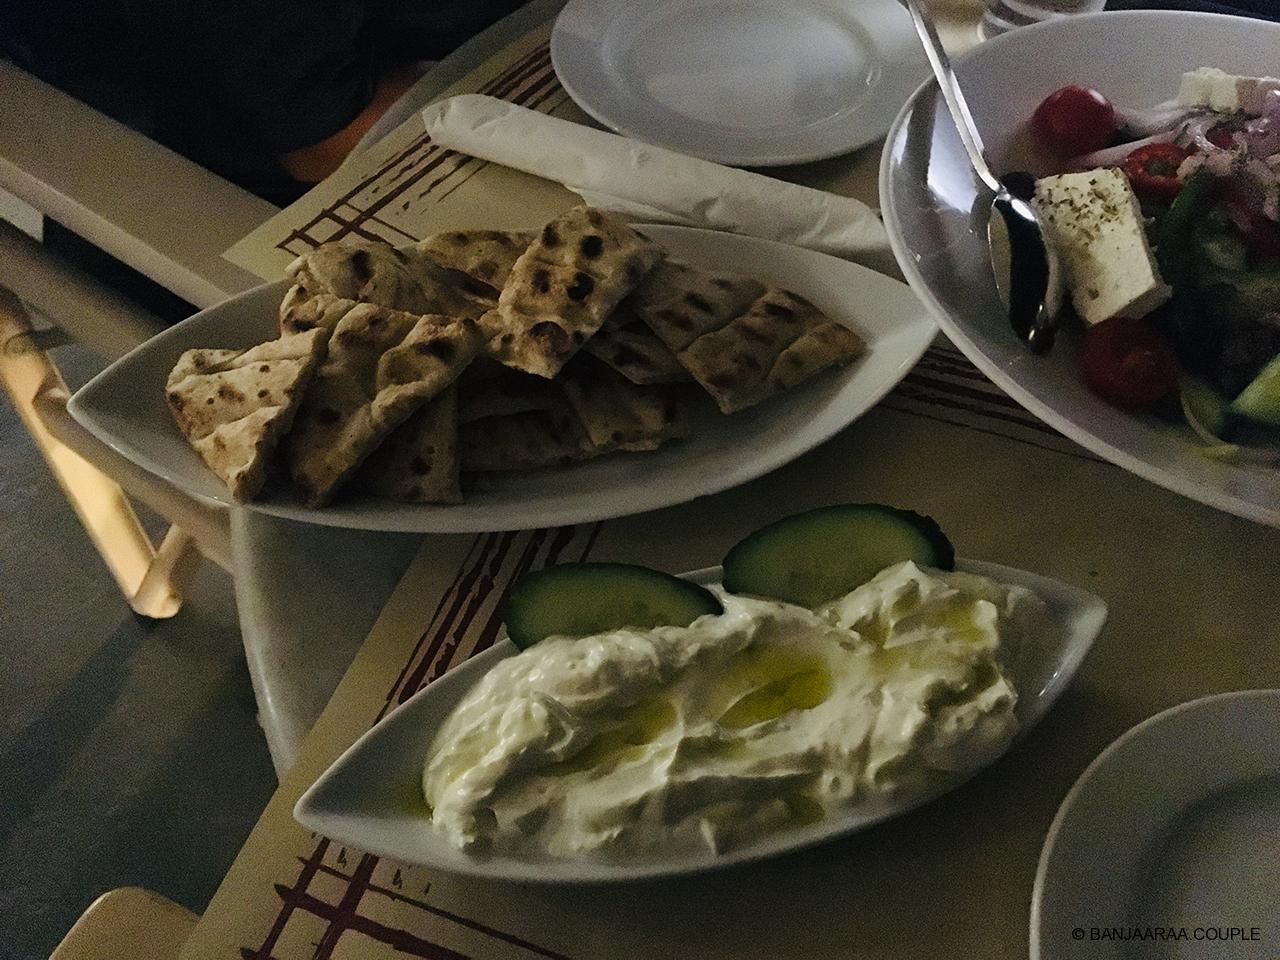 Greek Salad and Tzatziki with bread.